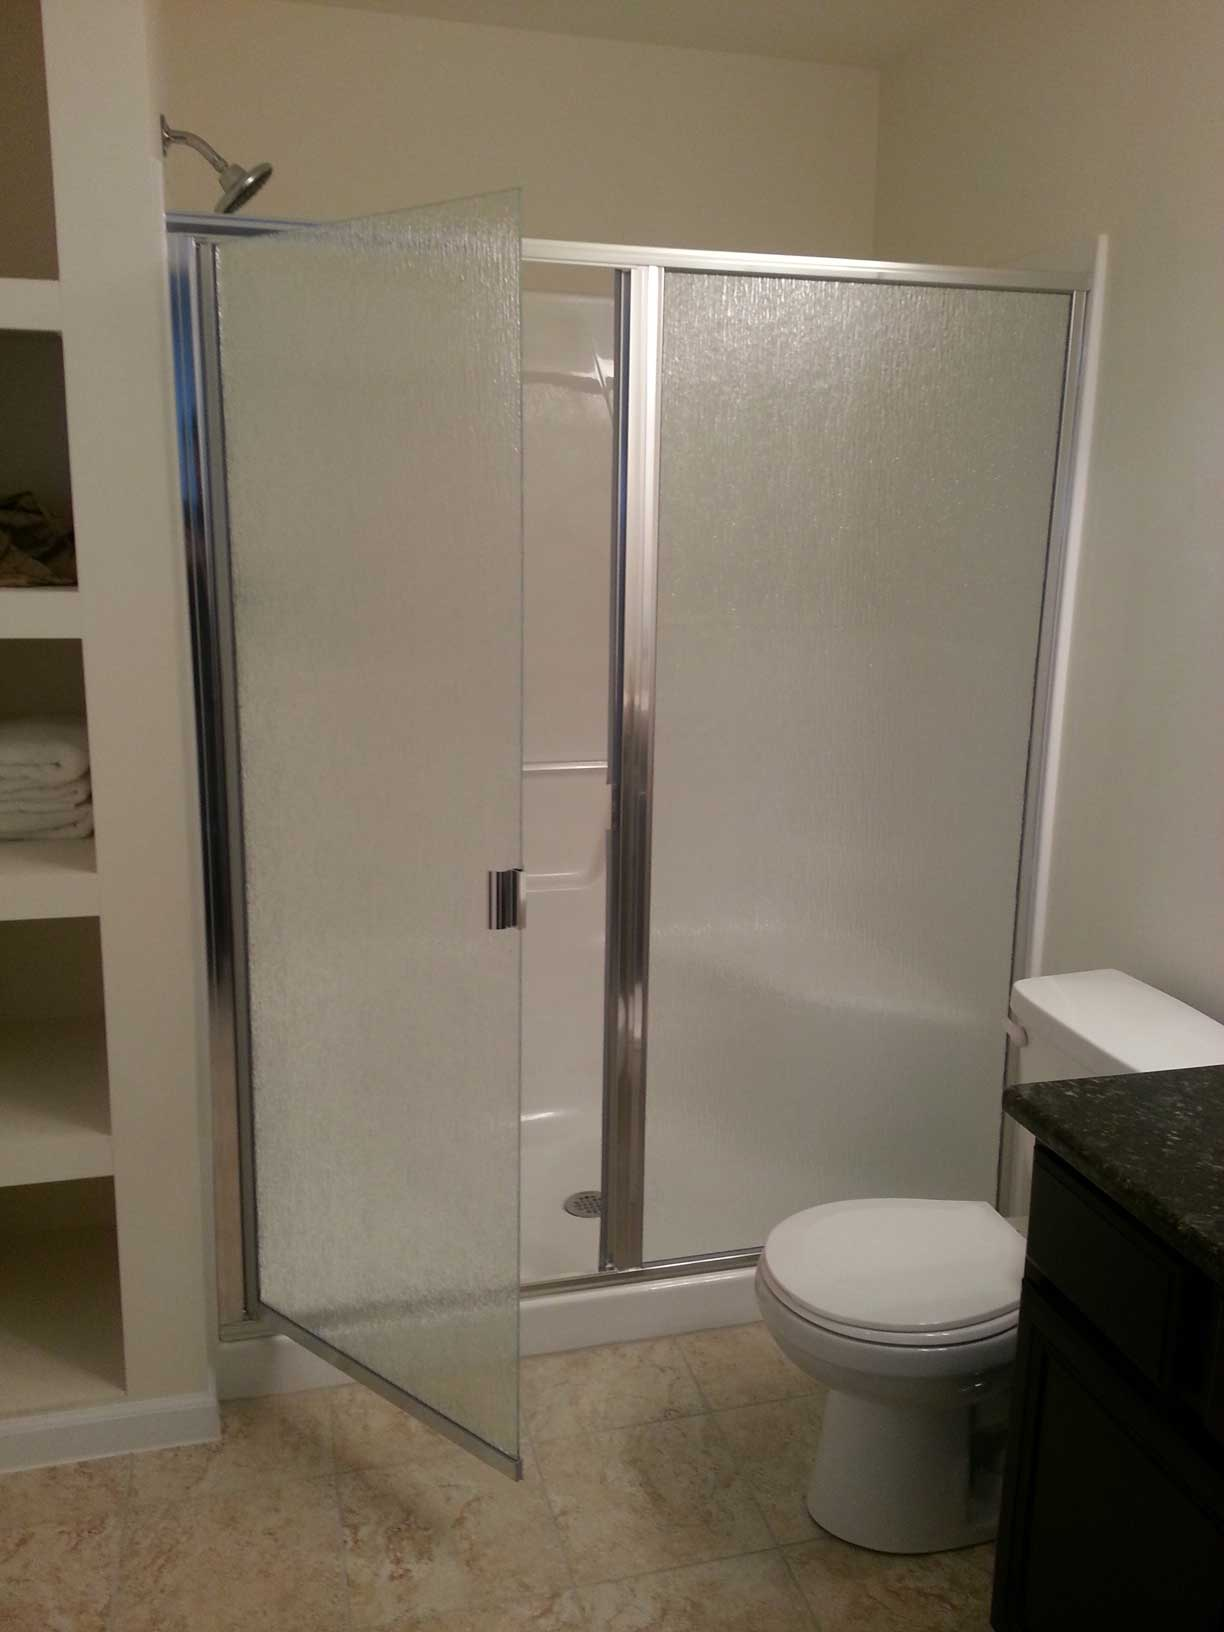 village glass company of south lyon mi shower doors and enclosures skyline shower enclosure